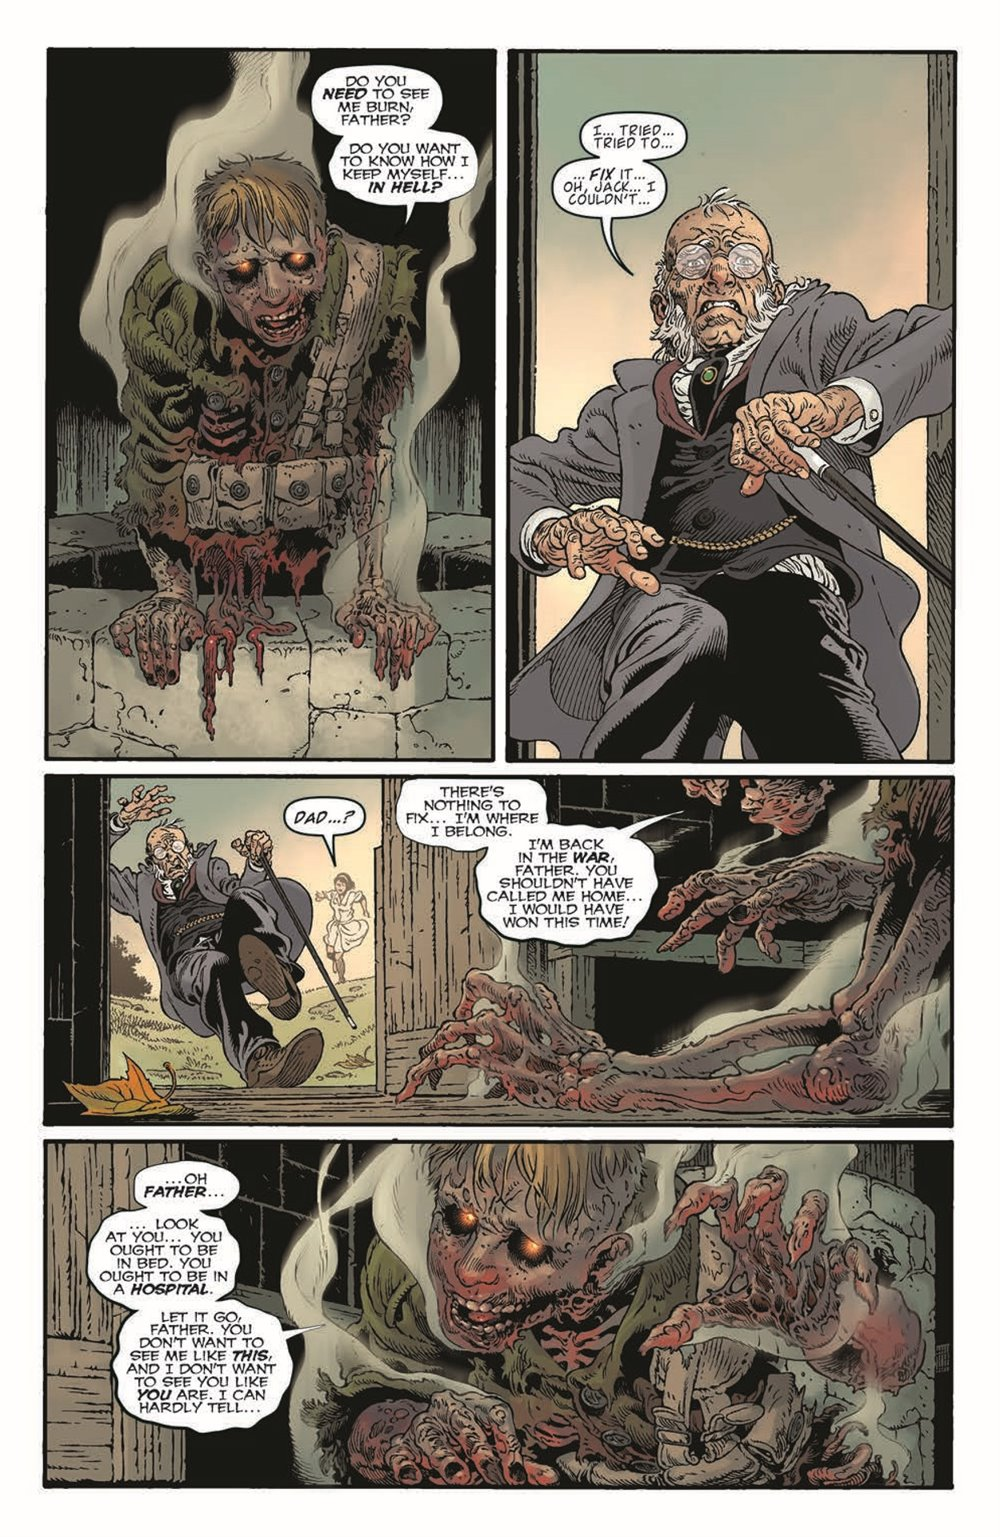 LnK-Sandman01_pr-4 ComicList Previews: LOCKE AND KEY THE SANDMAN UNIVERSE HELL AND GONE #1